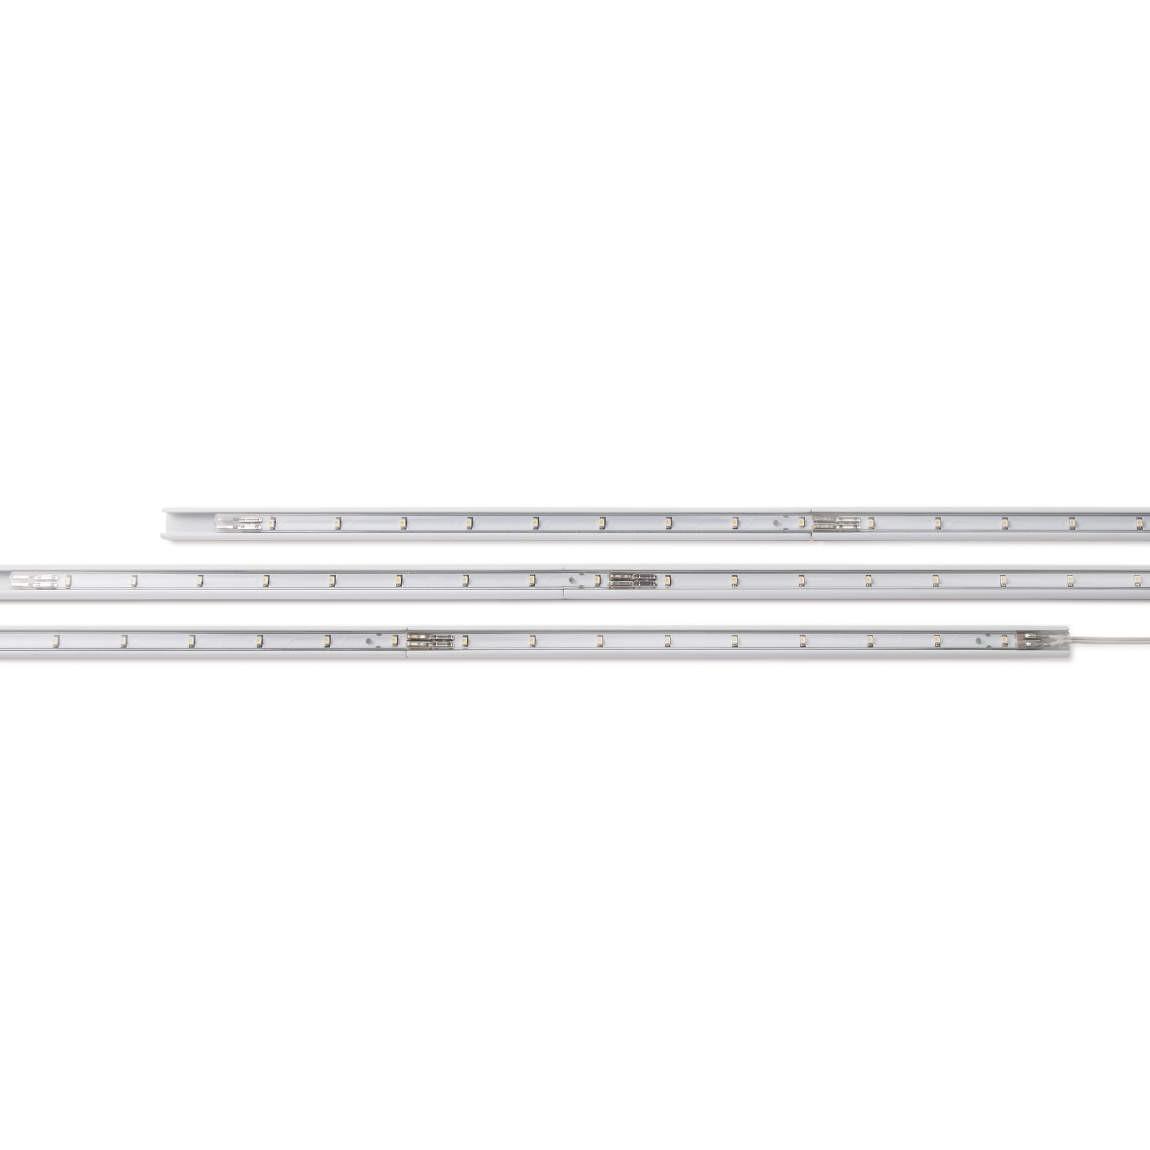 Innr Strip ST 110 (10er Set) - LED-Strip - Weiß